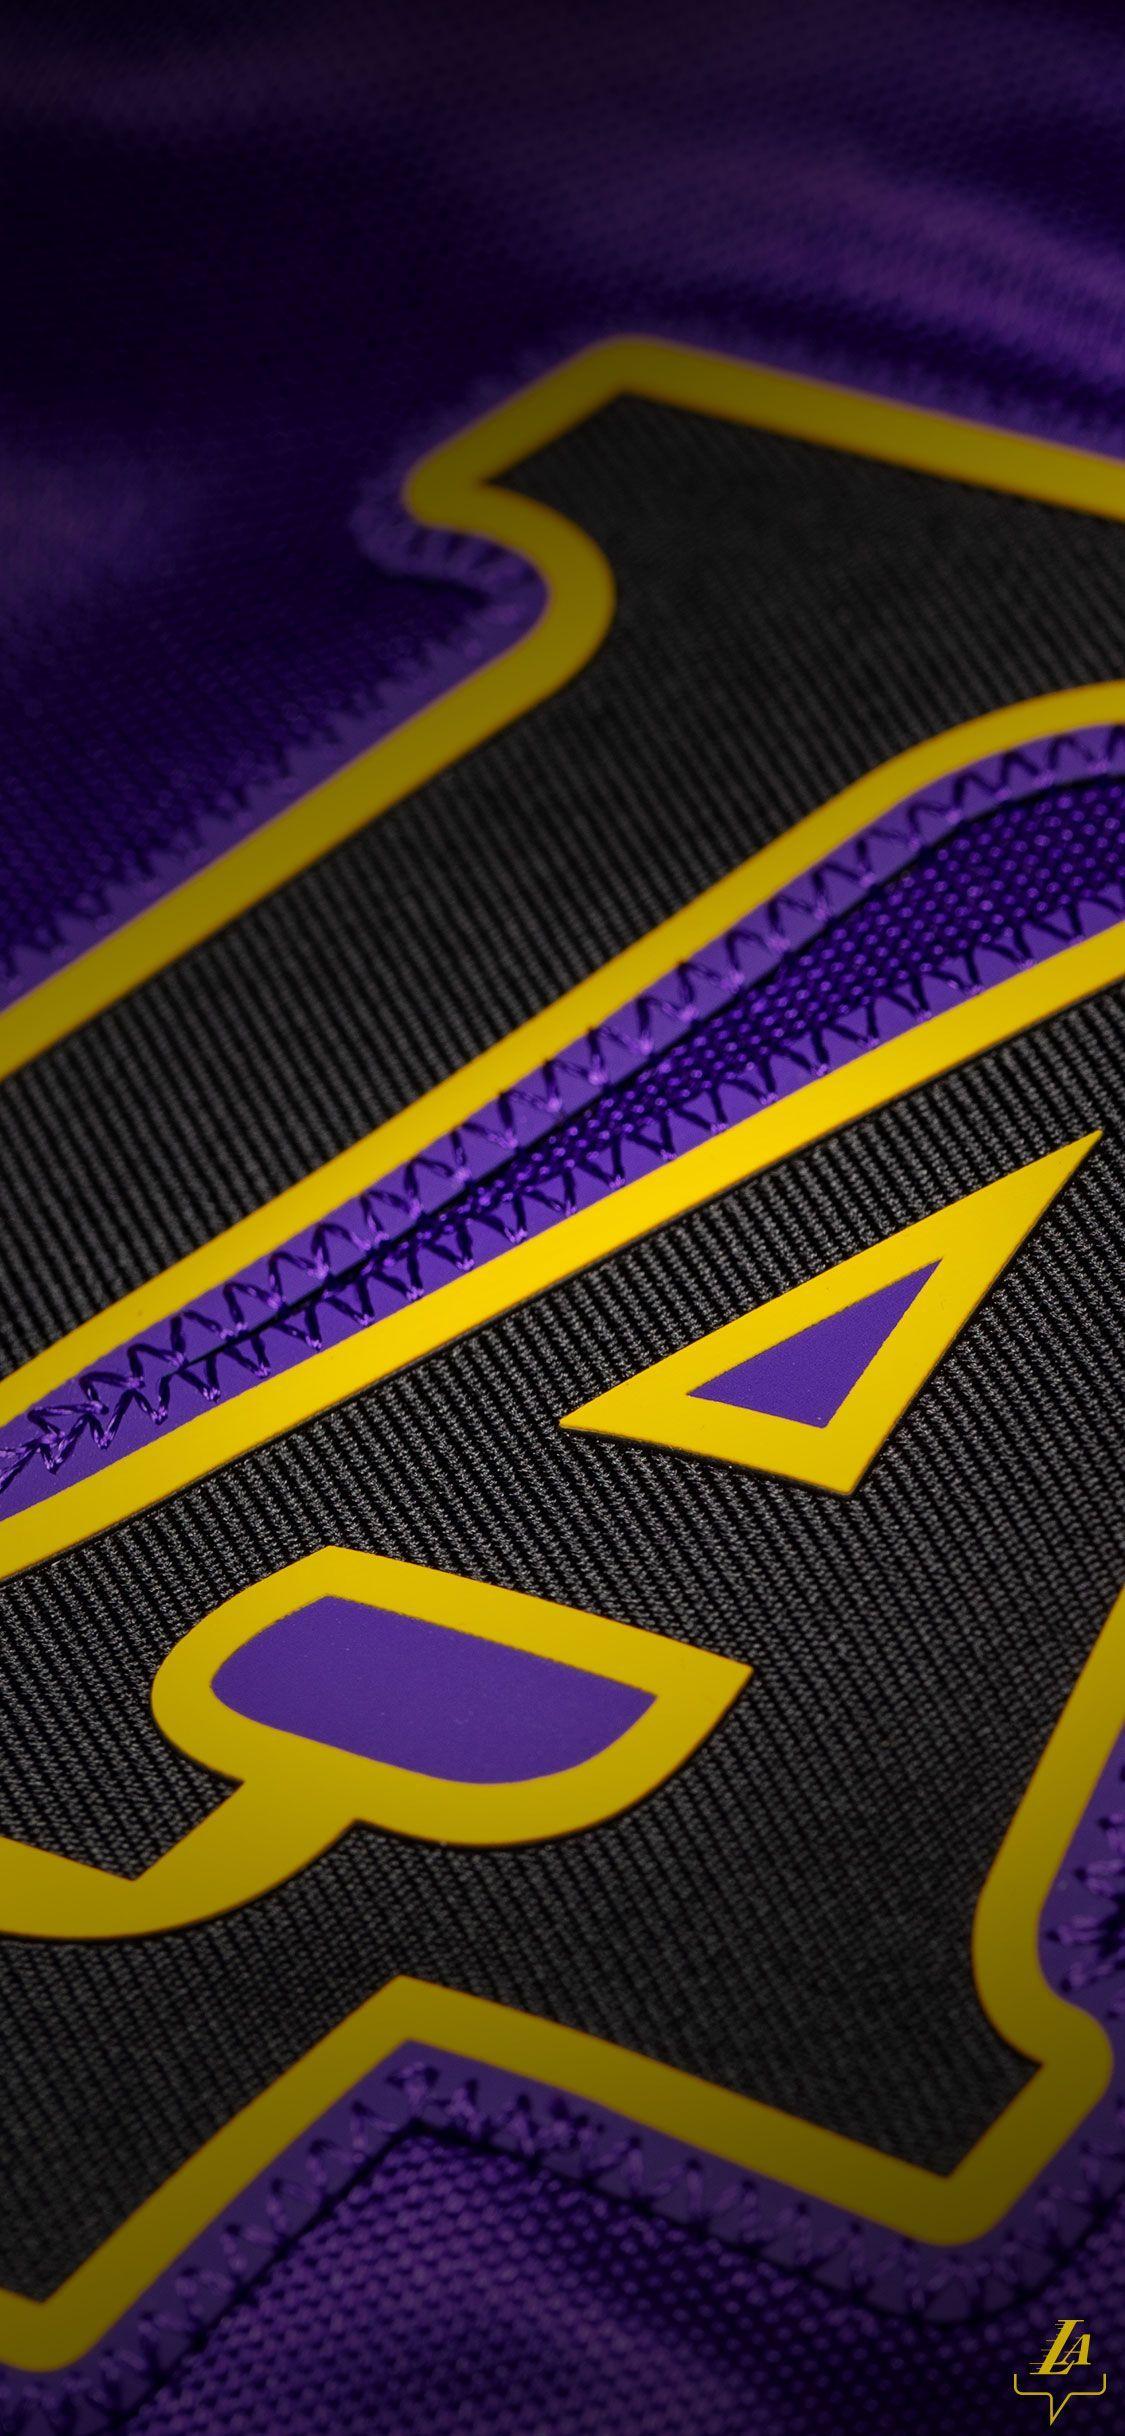 Iphone Xs Football Wallpaper Http Wallpapersalbum Com Iphone Xs Football Wallpaper Html In 2020 Lakers Wallpaper Lakers Logo Lebron James Lakers